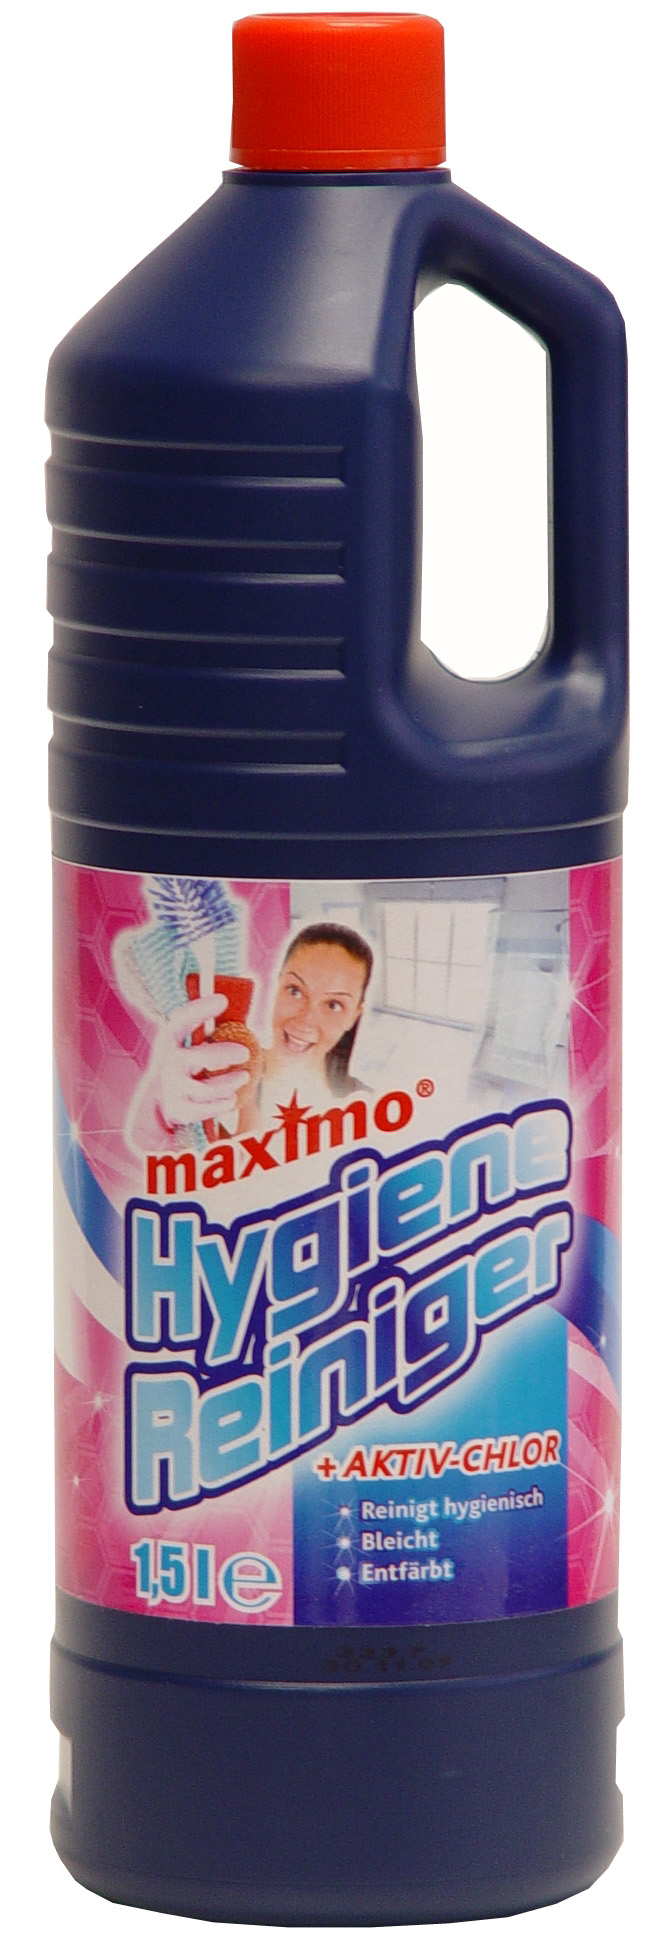 01887 - Aktiv Chlor Hygiene Reiniger 1500 ml